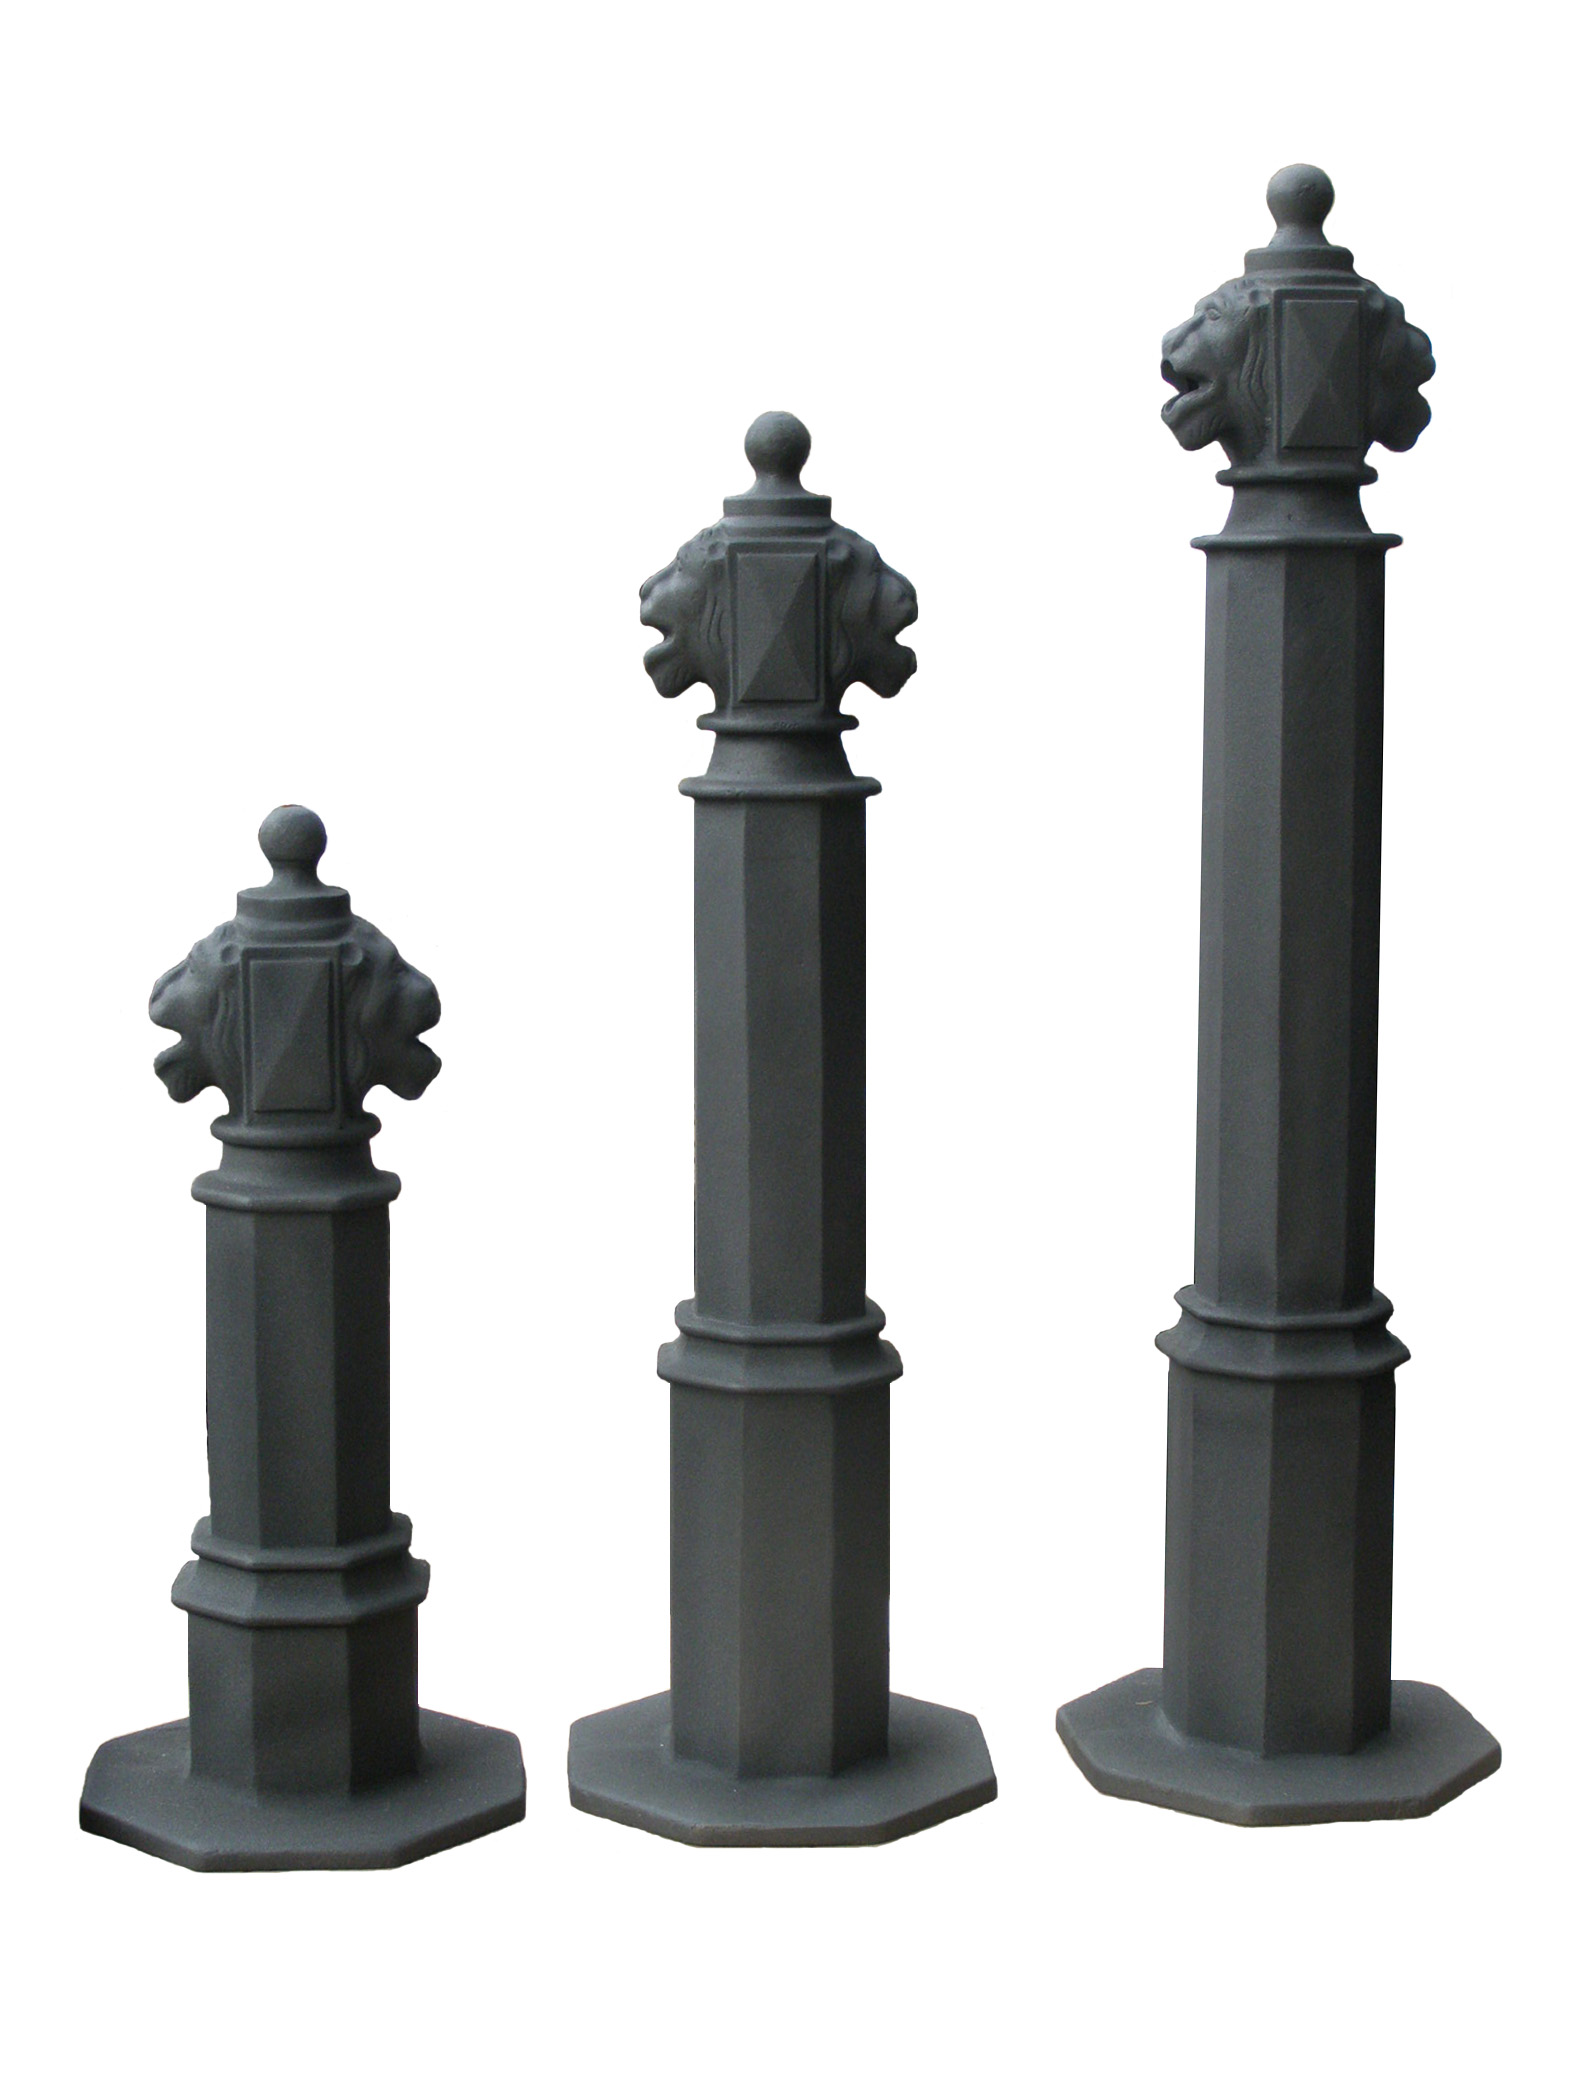 Stalpi ornamentali de protectie si delimitare BRAMAL LIGHT - Poza 3